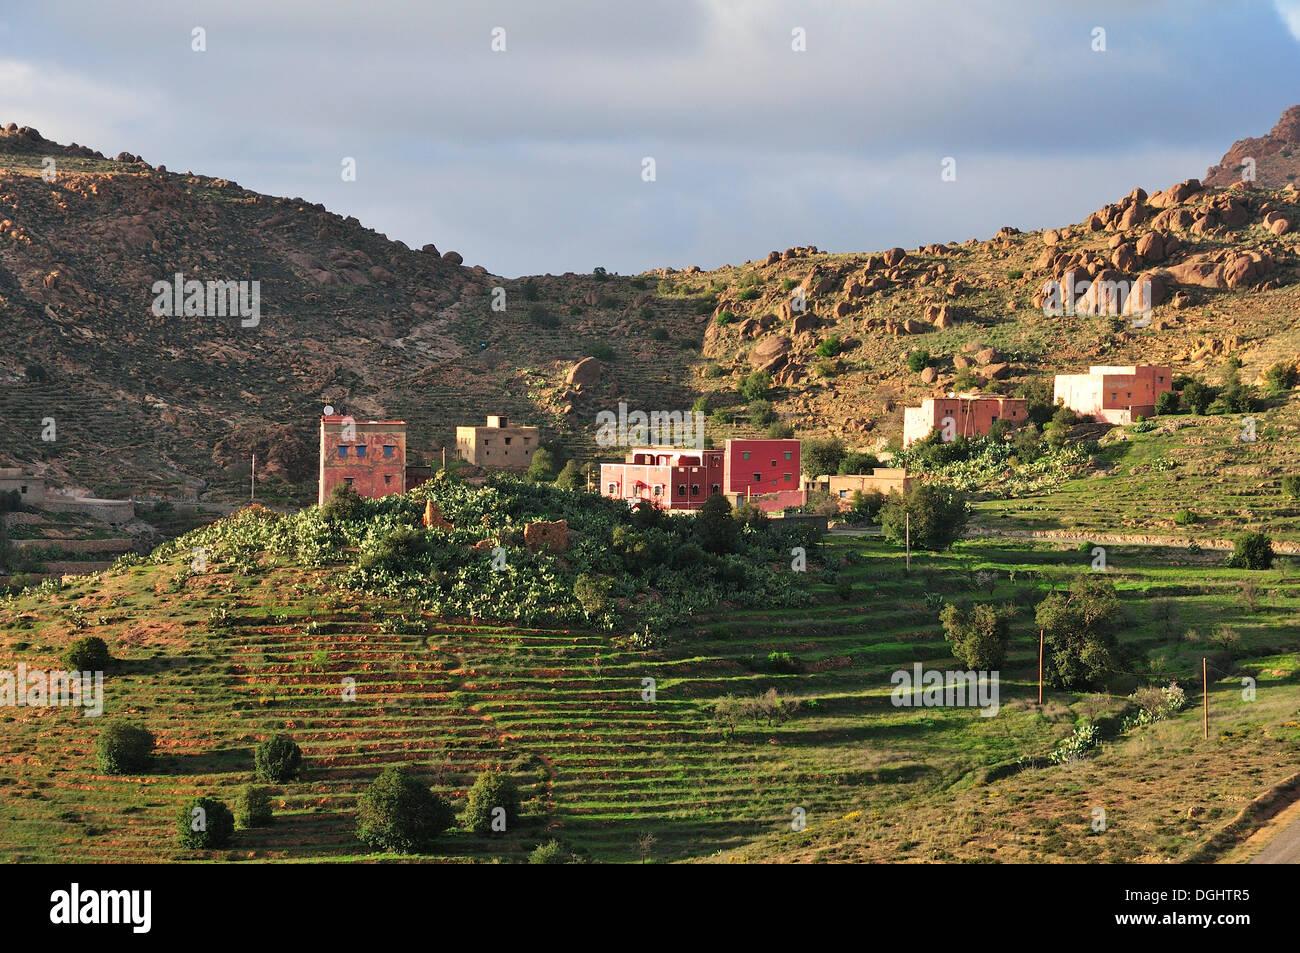 Farmhouses in a barren mountain landscape, Souss-Massa-Draâ, Antiatlas, Morocco - Stock Image